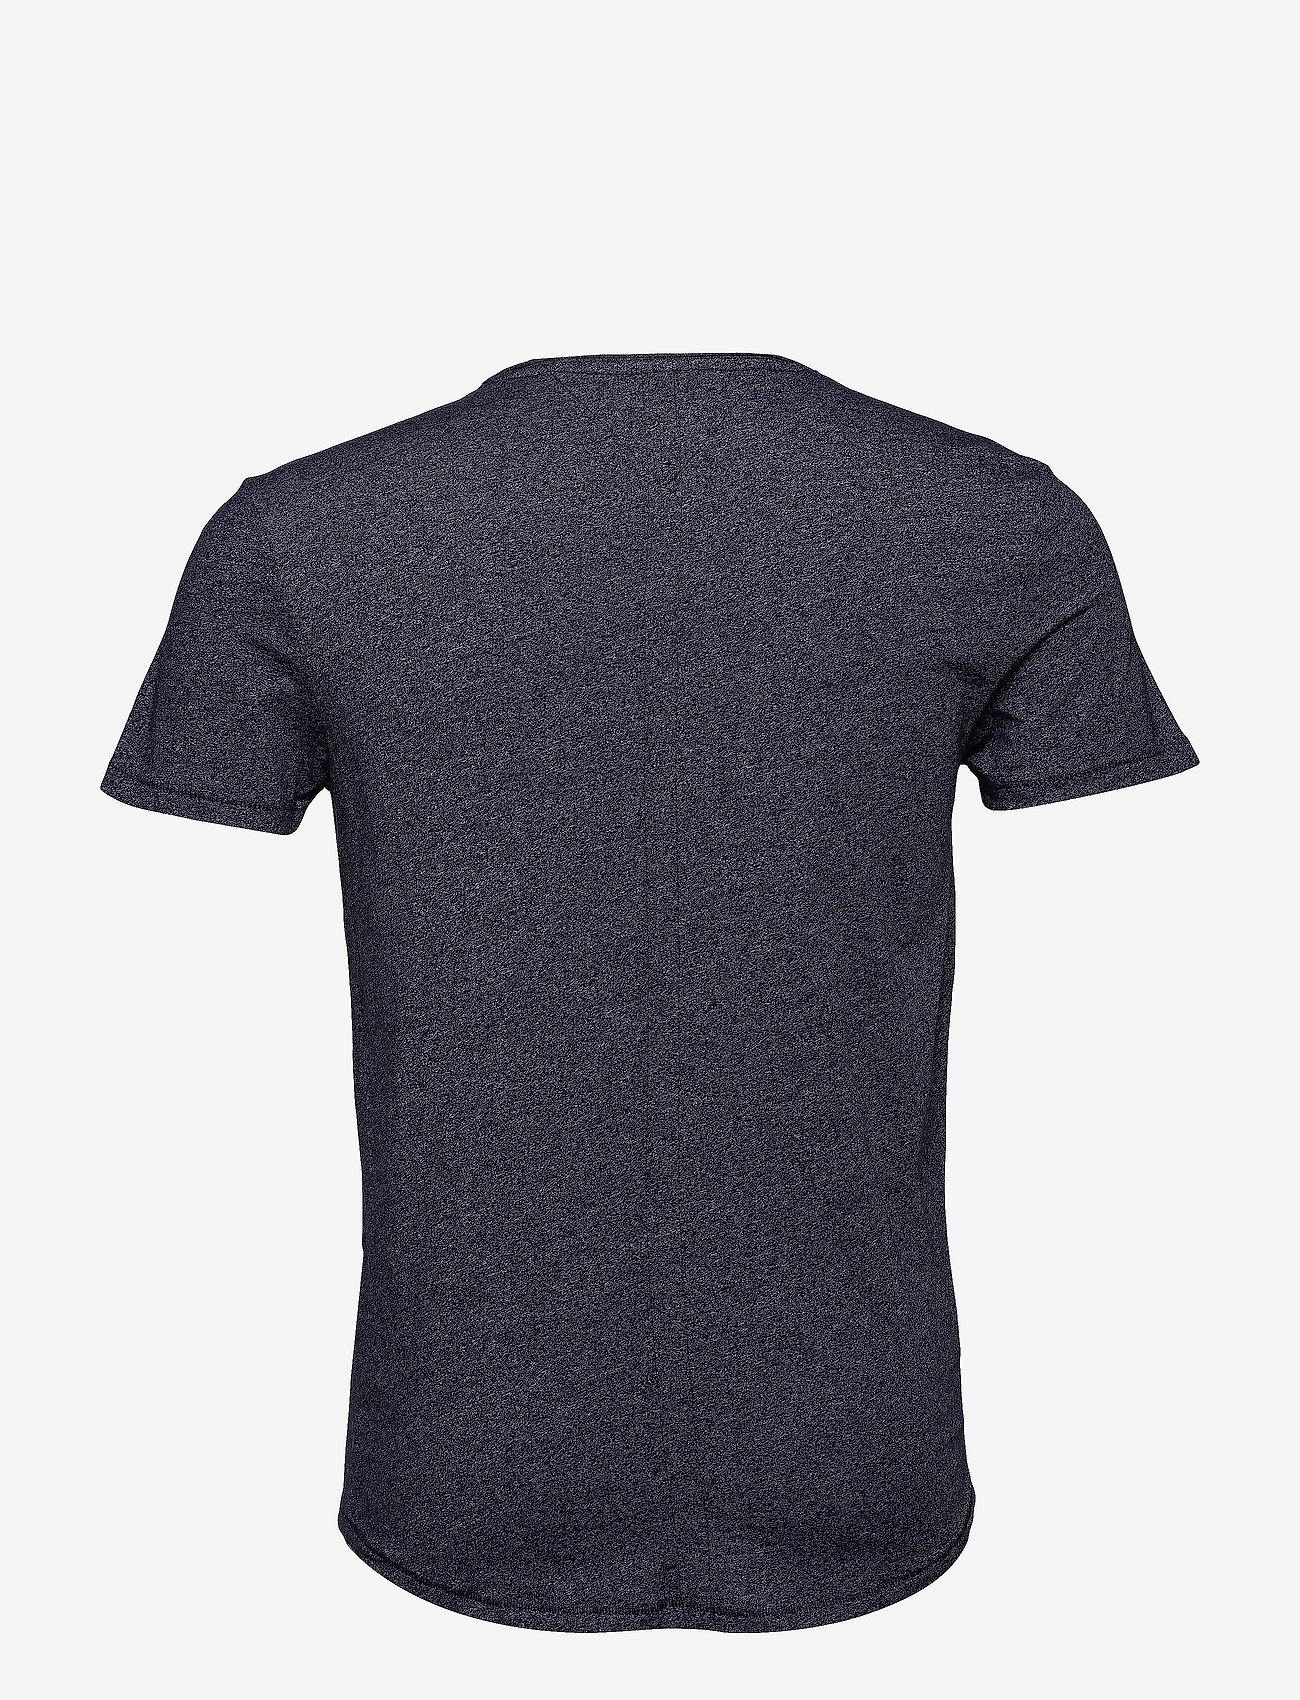 Tommy Jeans - TJM ESSENTIAL JASPE TEE - short-sleeved t-shirts - black iris - 1